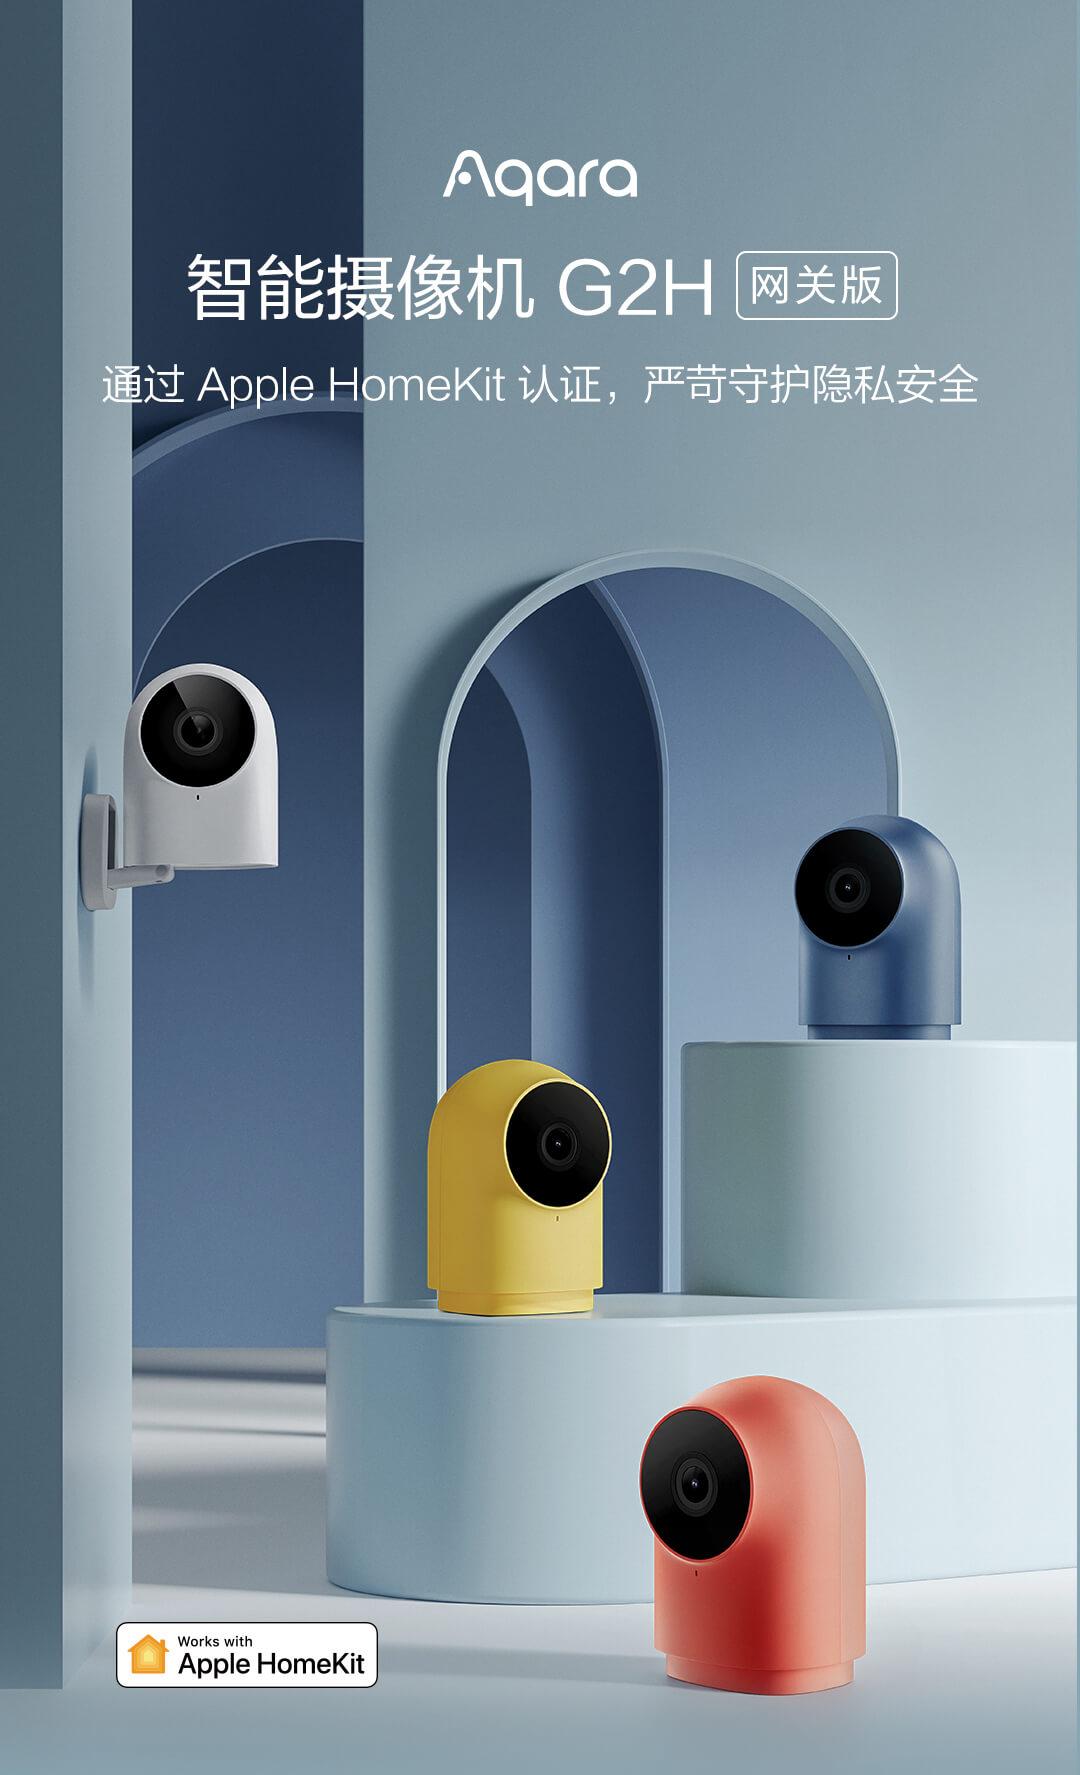 Aqara 智能摄像机 G2H 网关版